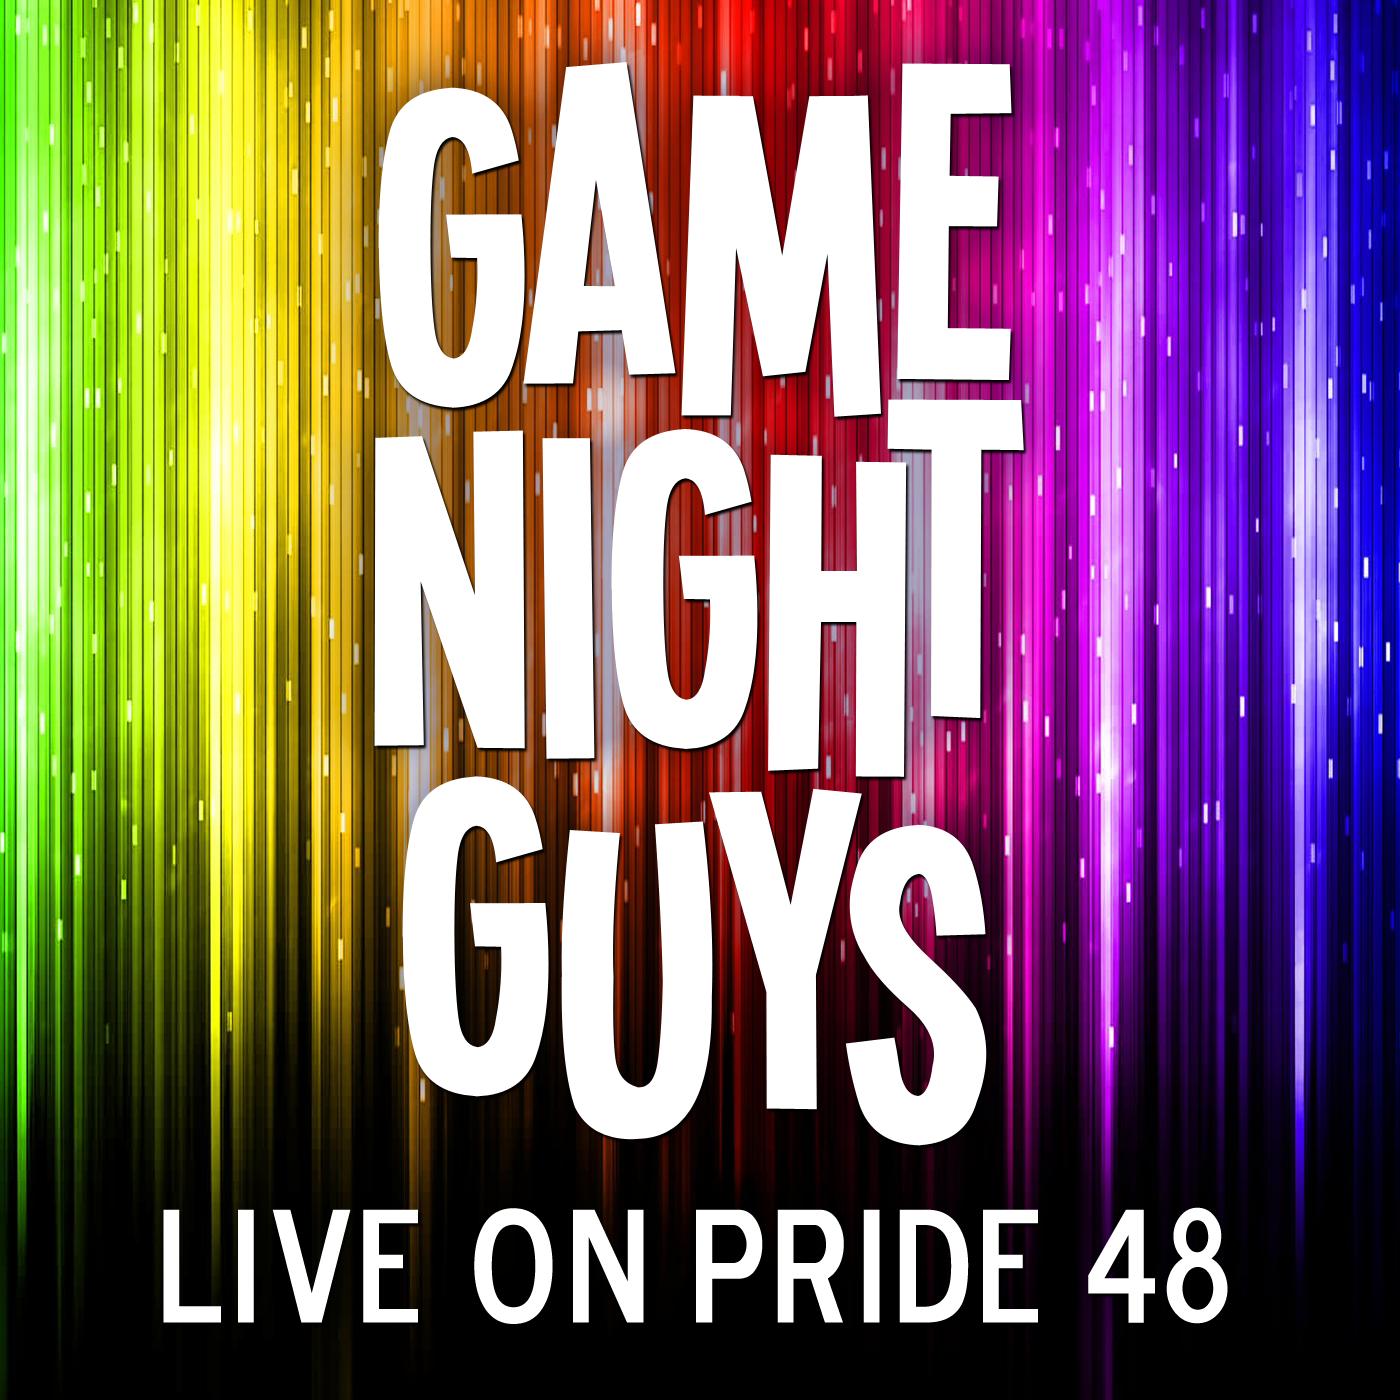 Live on Pride 48